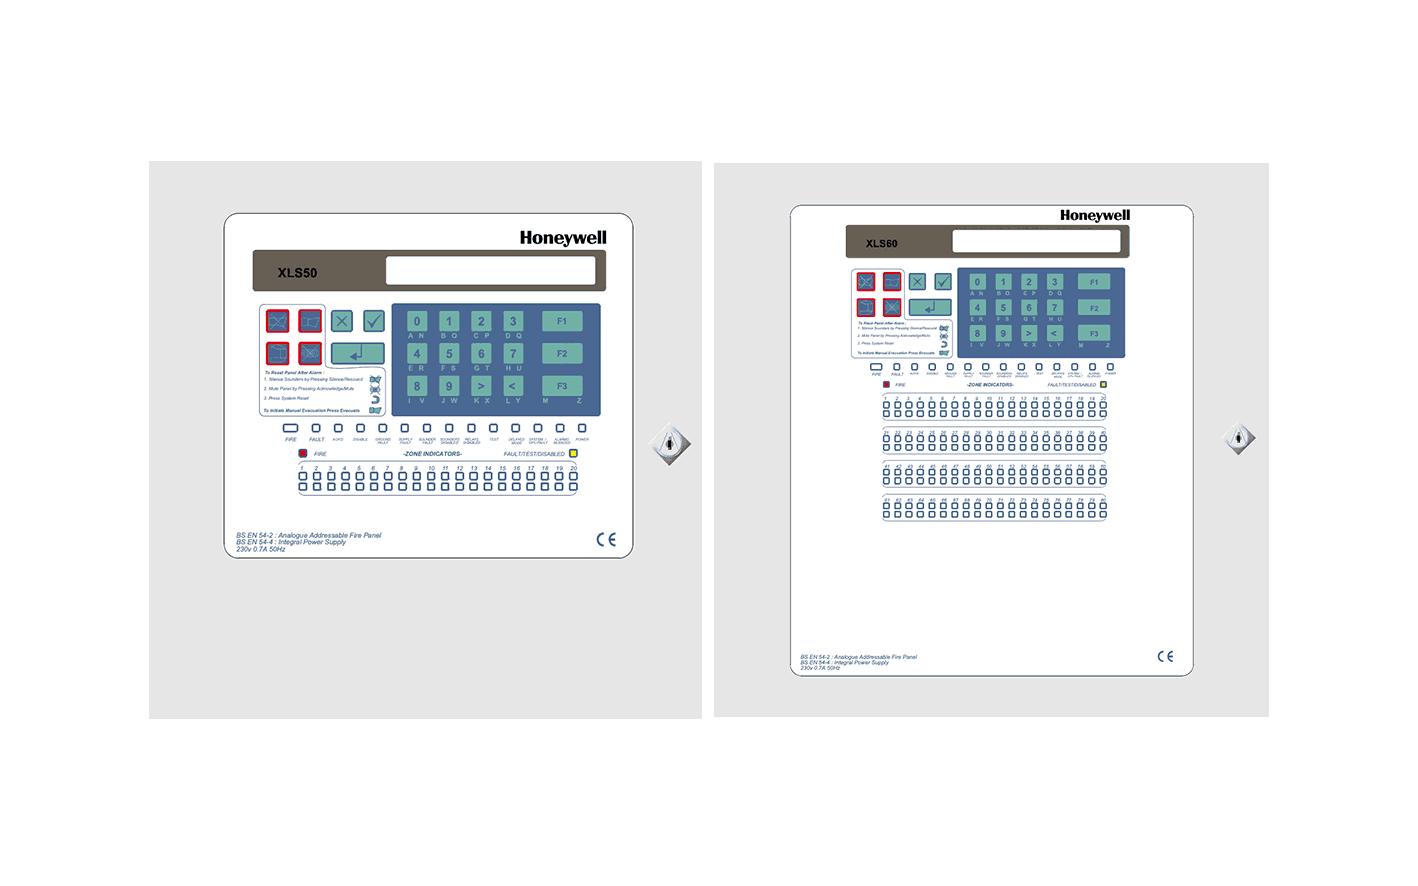 Morley ZX1-2-5 Thumbnail website